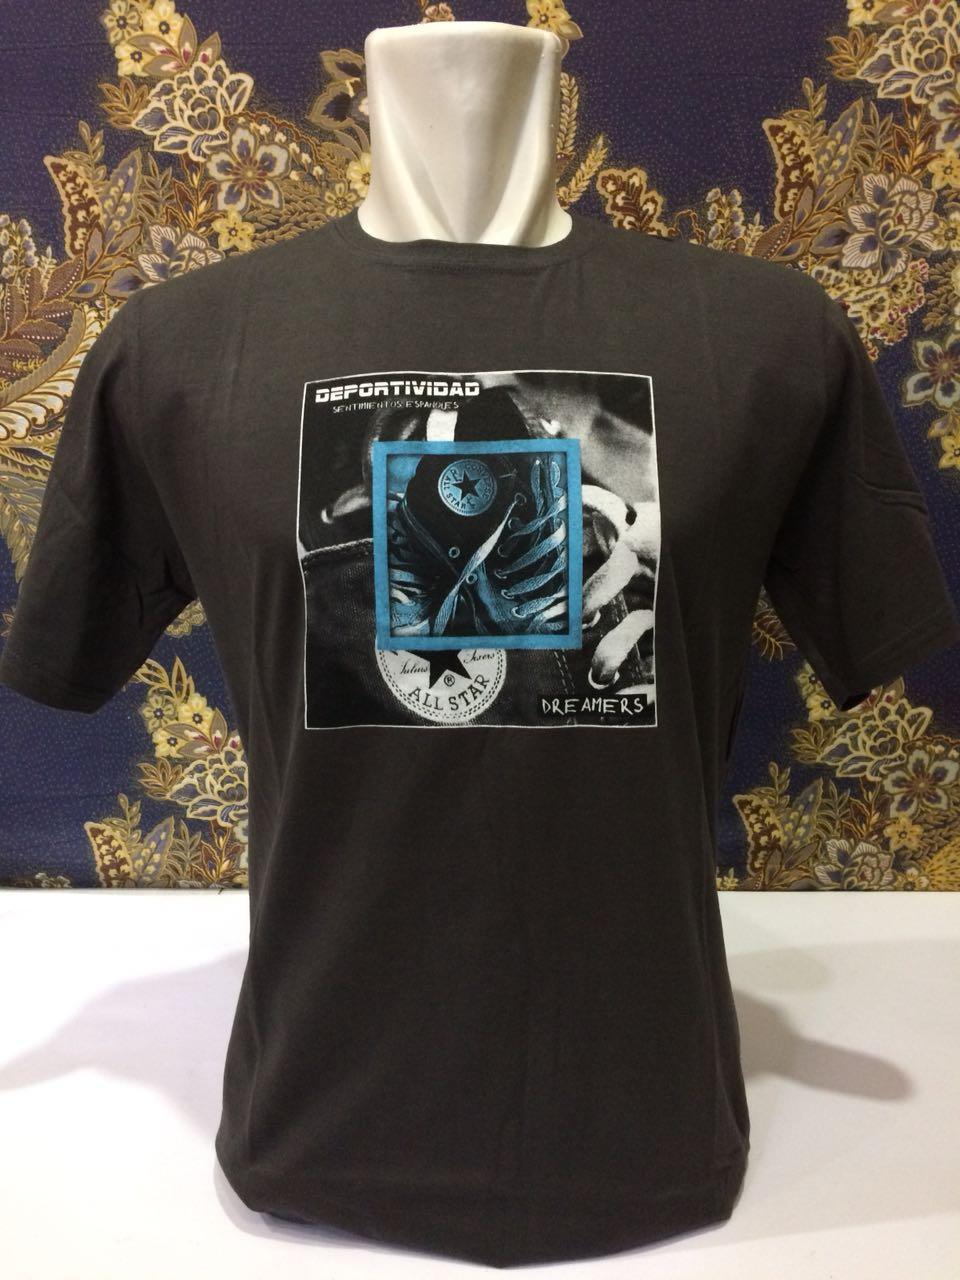 FYA Shope - Kaos T-Shirt Kaos Distro Premium 100% Combed Cotton / Converse